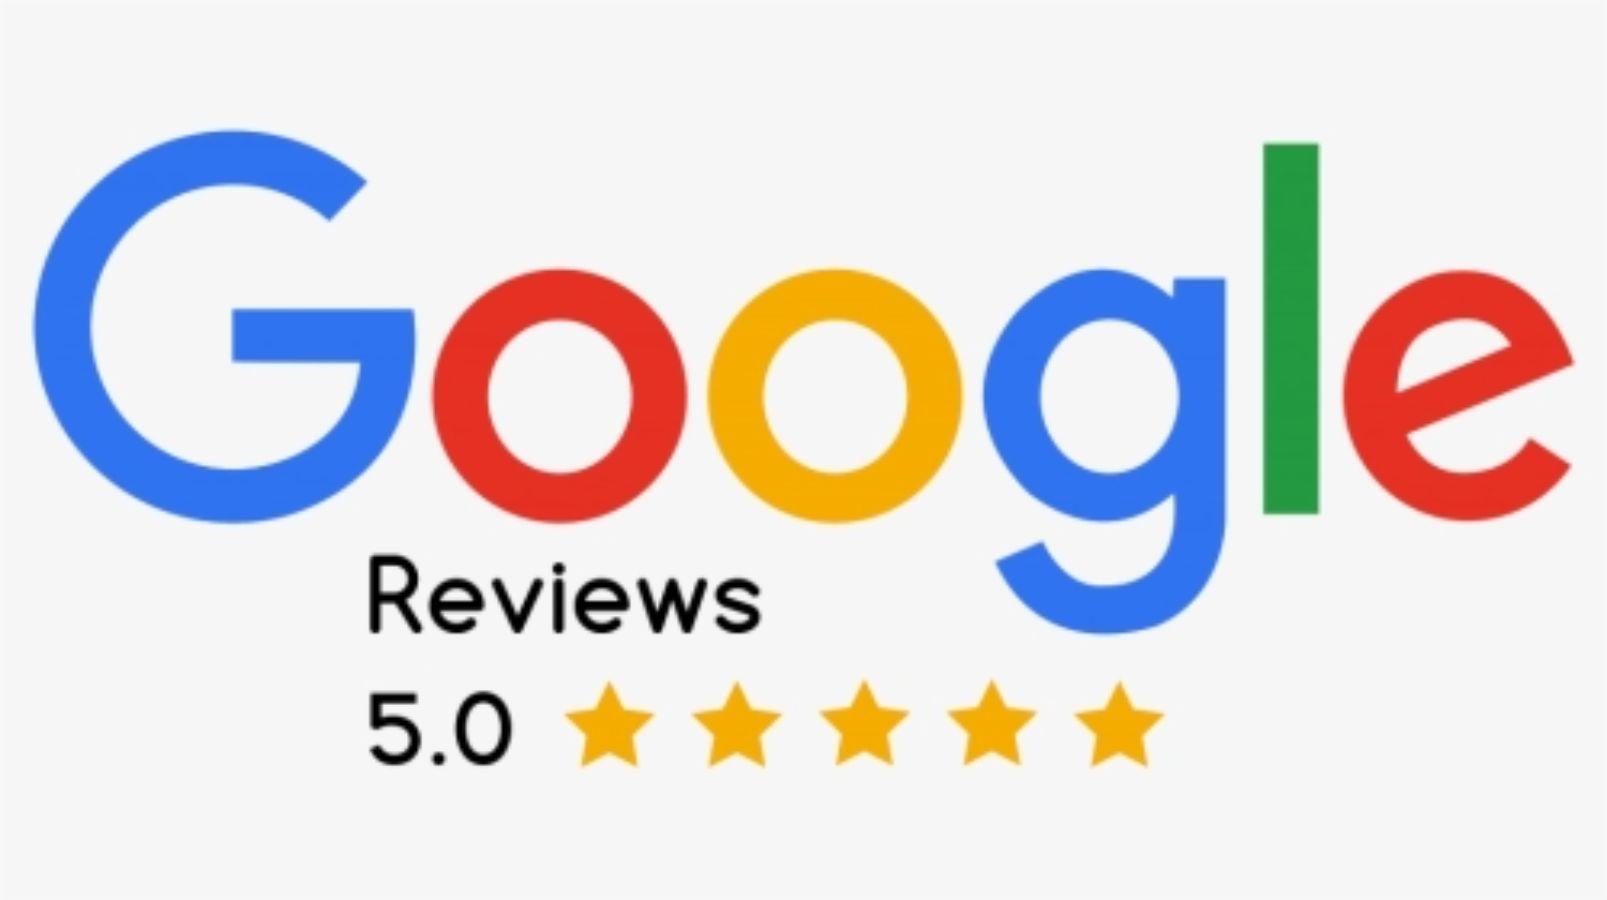 523-5234612_google-reviews-hd-png-download